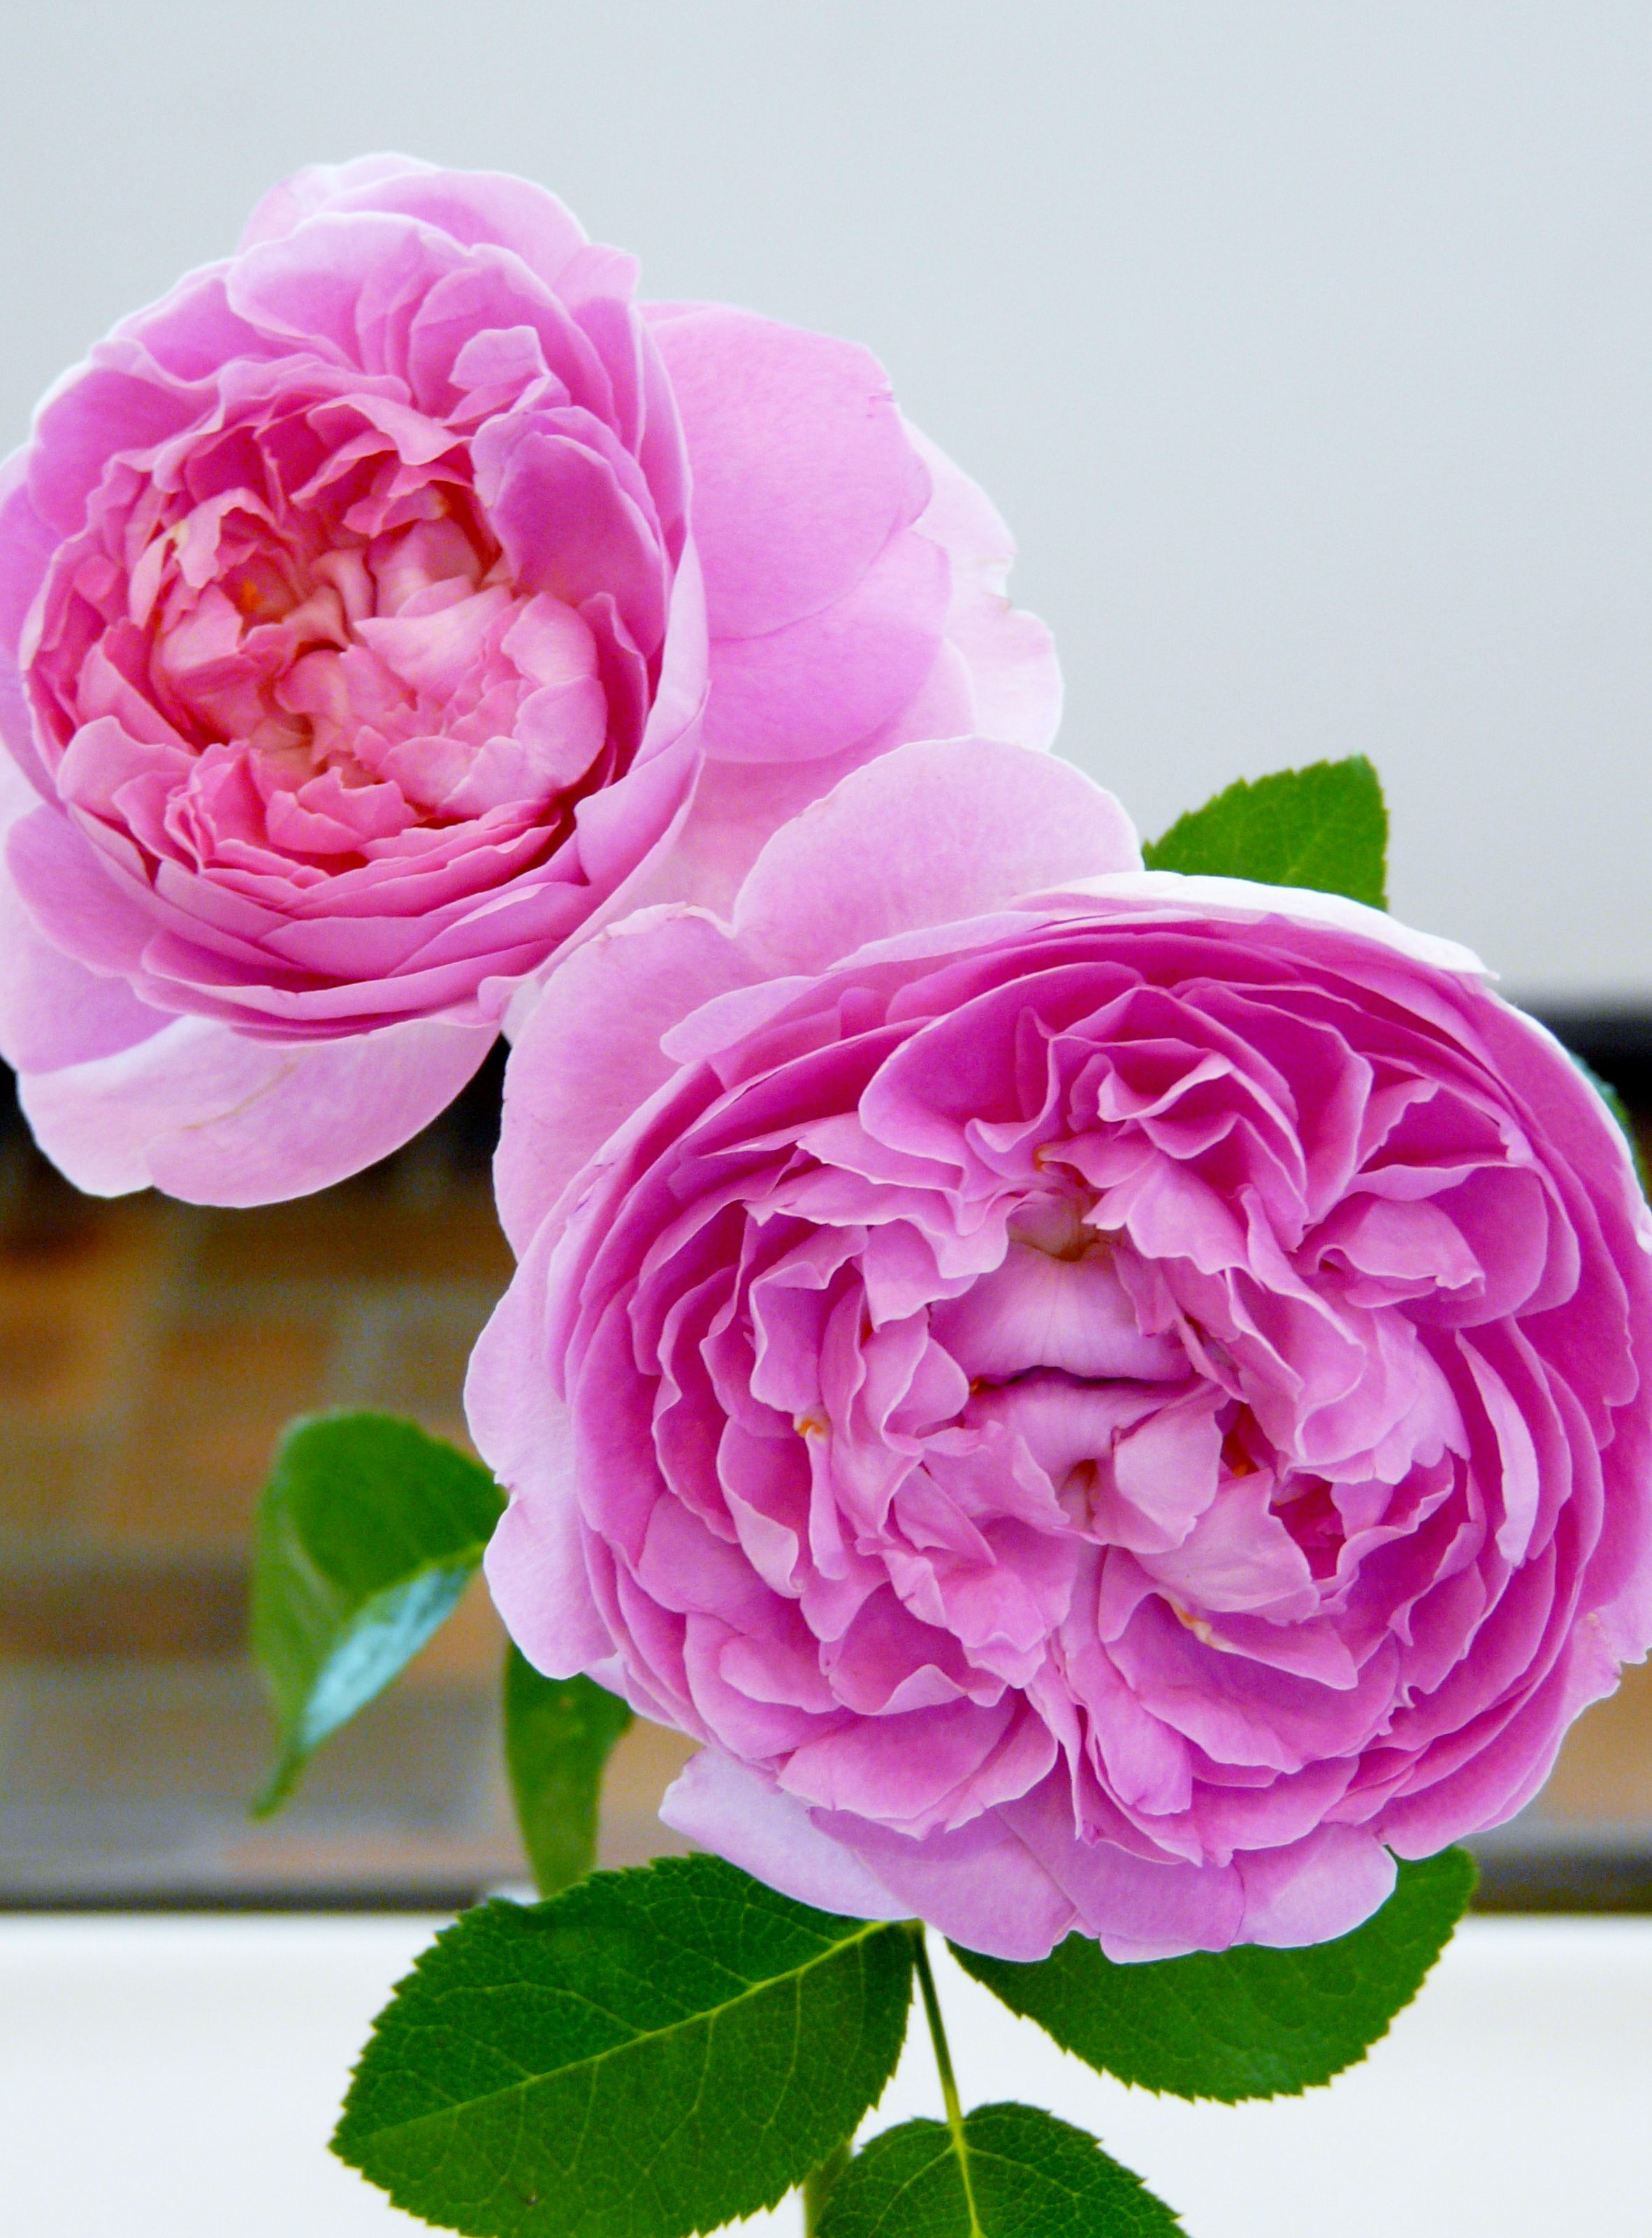 Chicago botanic gardens aug 2013 rose competition